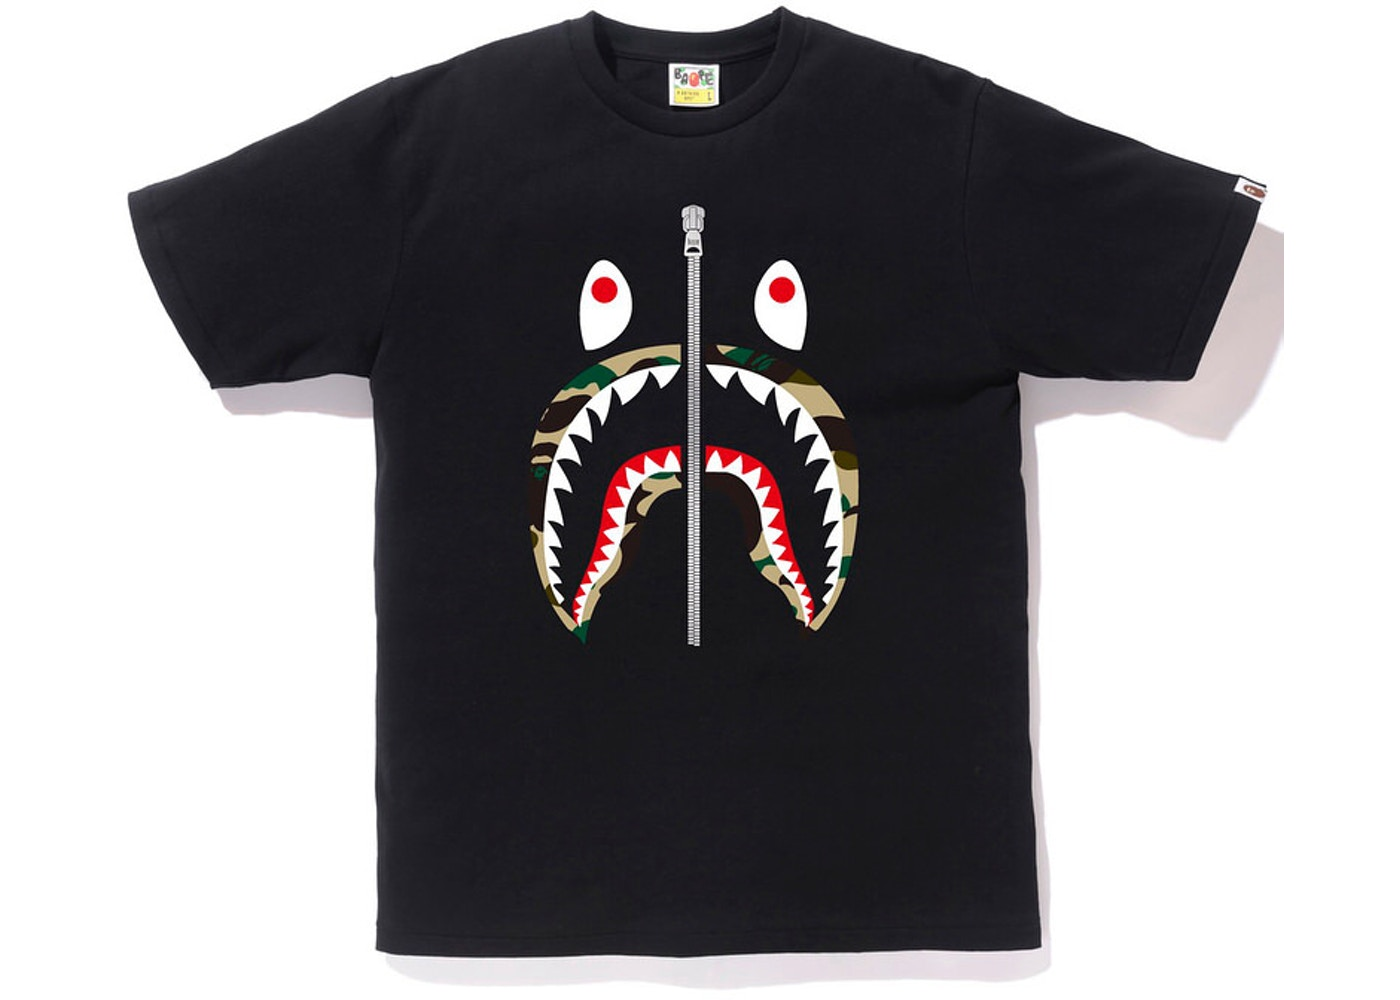 a503ed95 BAPE 1st Camo Shark Tee Tee Black/Yellow - SS18